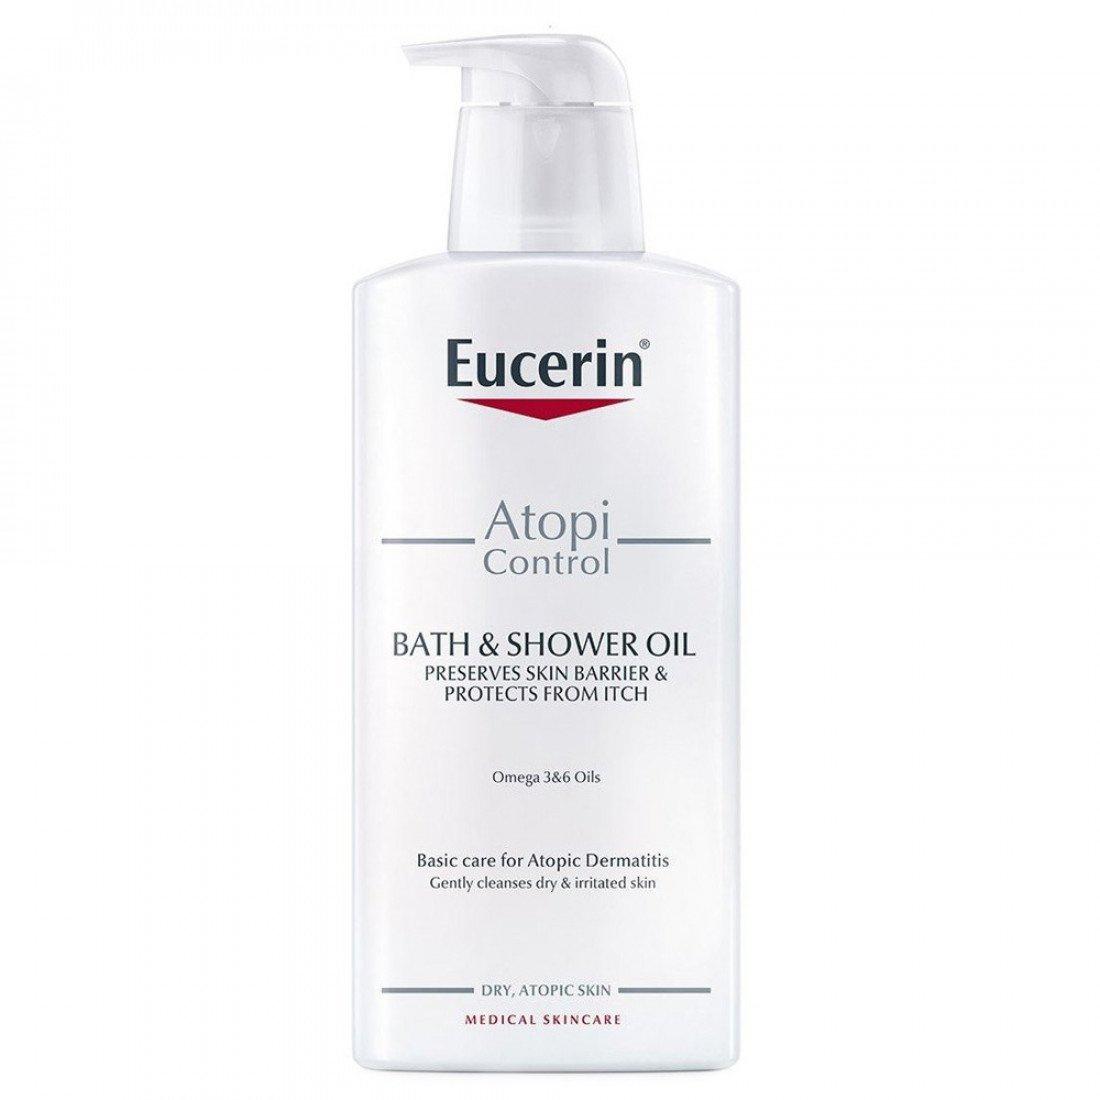 Eucerin Atopicontrol Bath & Shower Oil